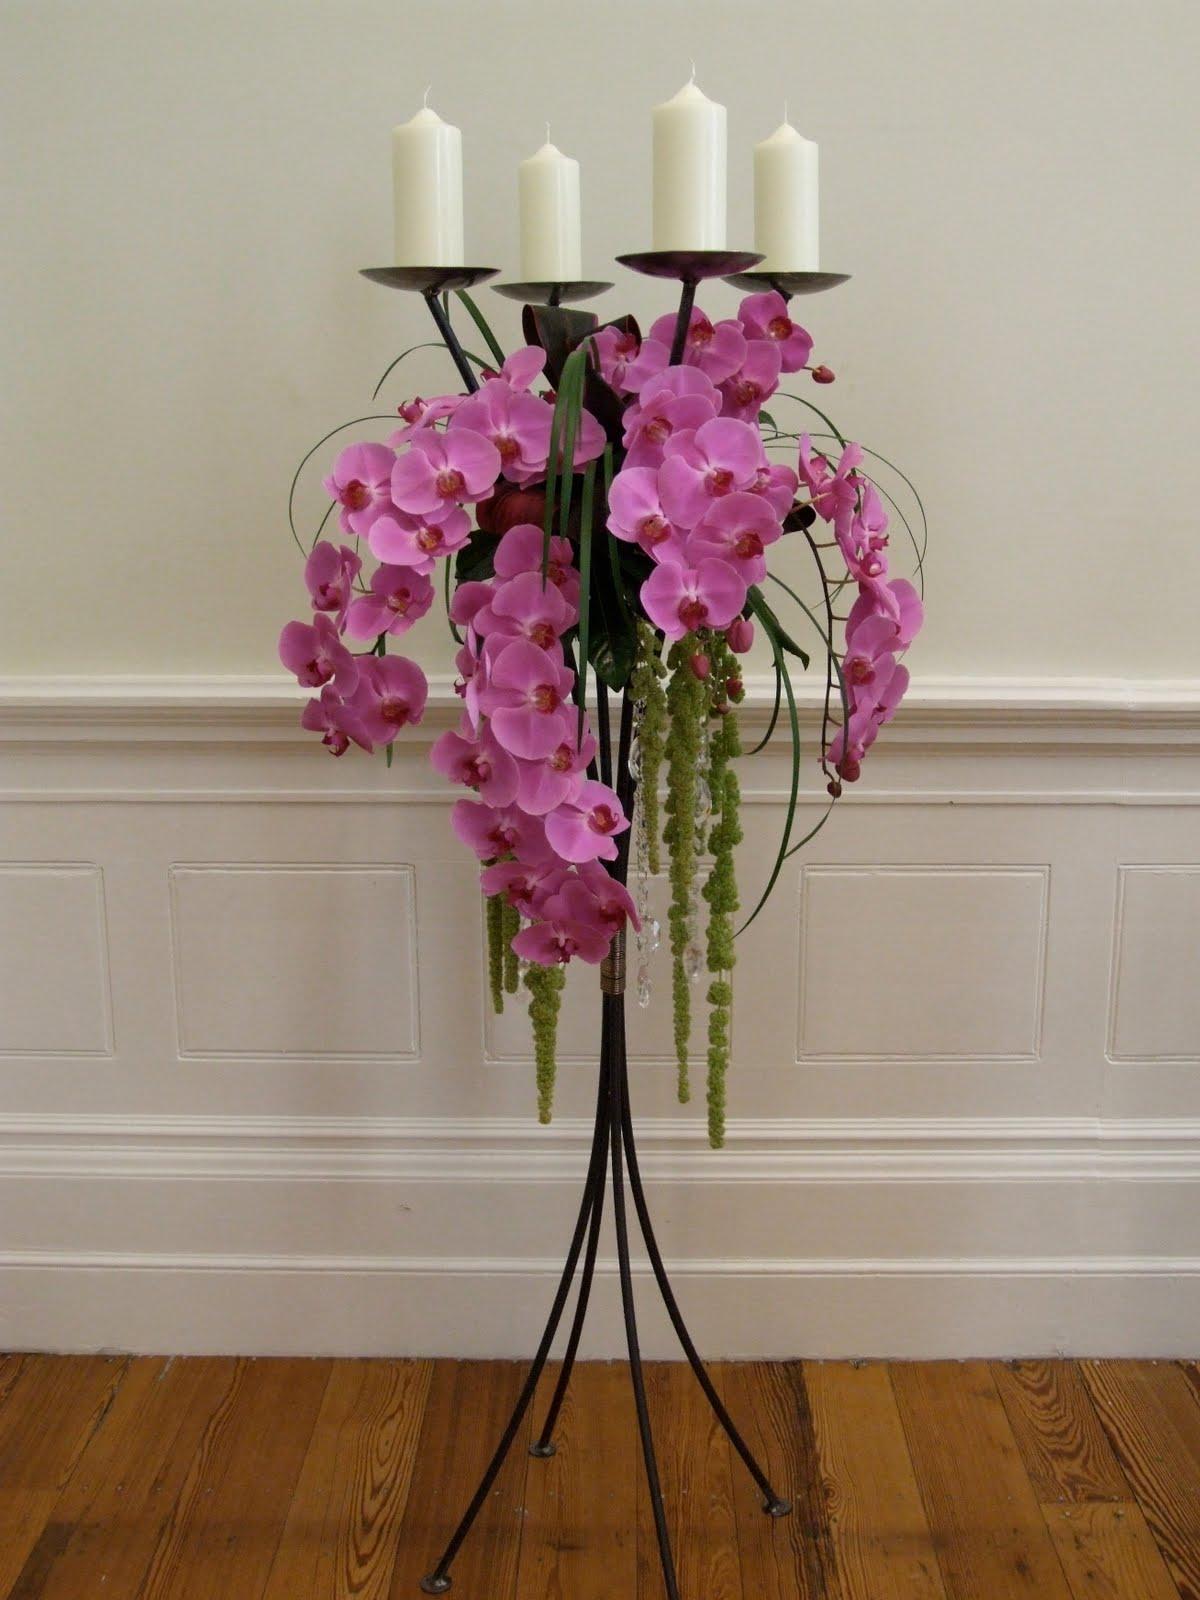 http://4.bp.blogspot.com/_pbR4rzHlM5k/TBpxpVbC-KI/AAAAAAAAAgk/0wm4WRCcjMw/s1600/pink+phalaenopsis+candlabra%5B1%5D+(2).jpg